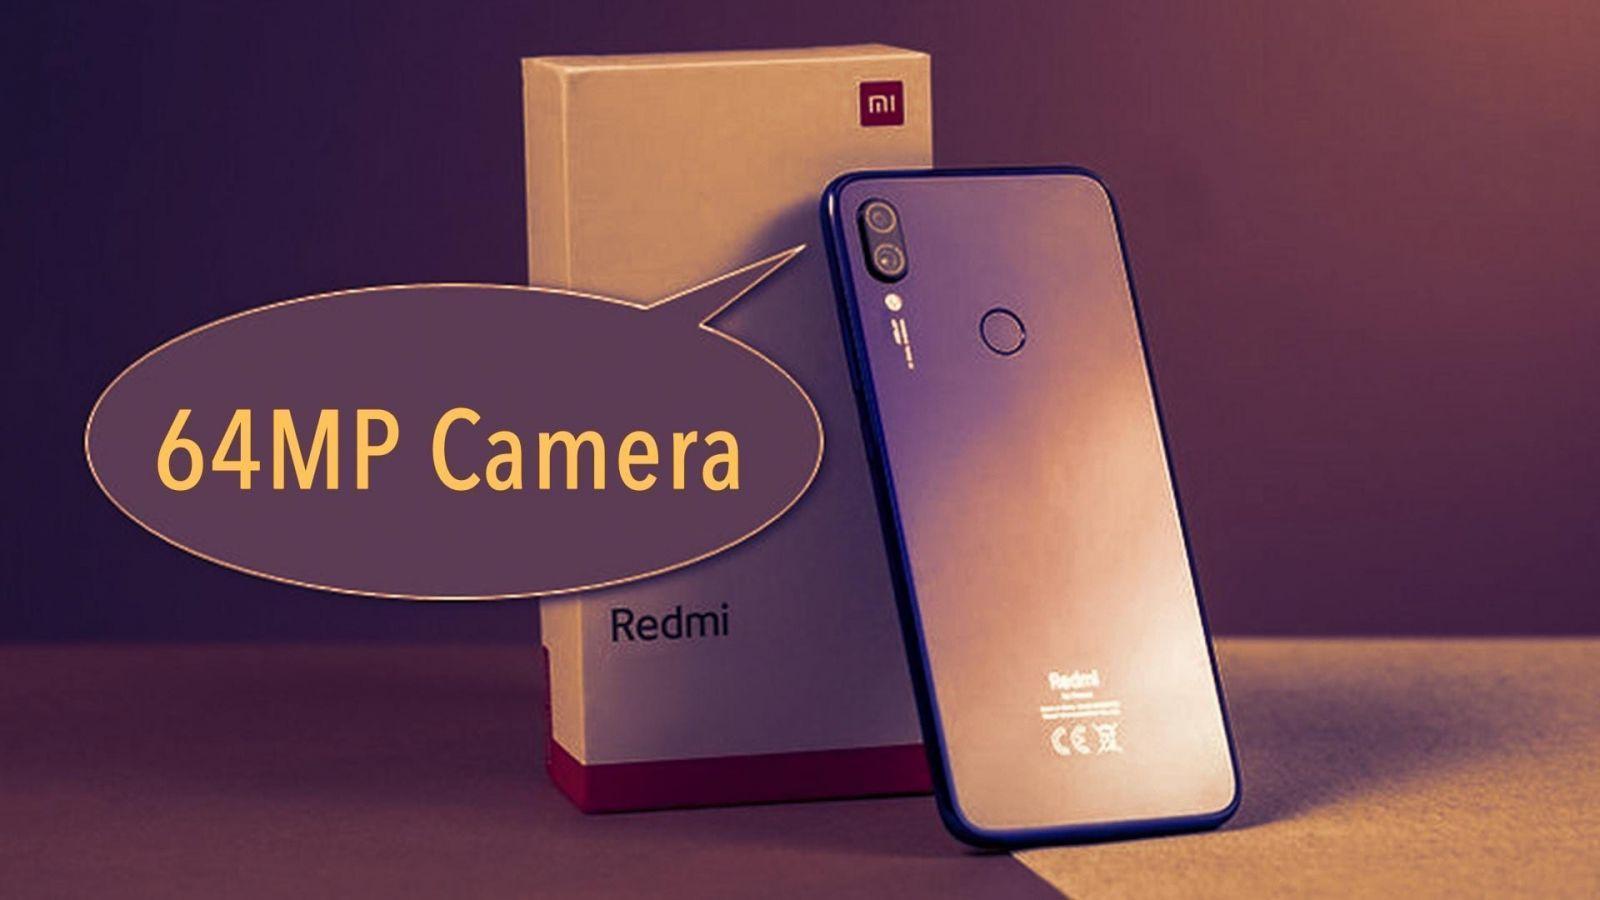 Xiaomi выпустит смартфон с 64-мегапиксельной камерой (redmi will release a smartphone with a 64 mp camera 2)